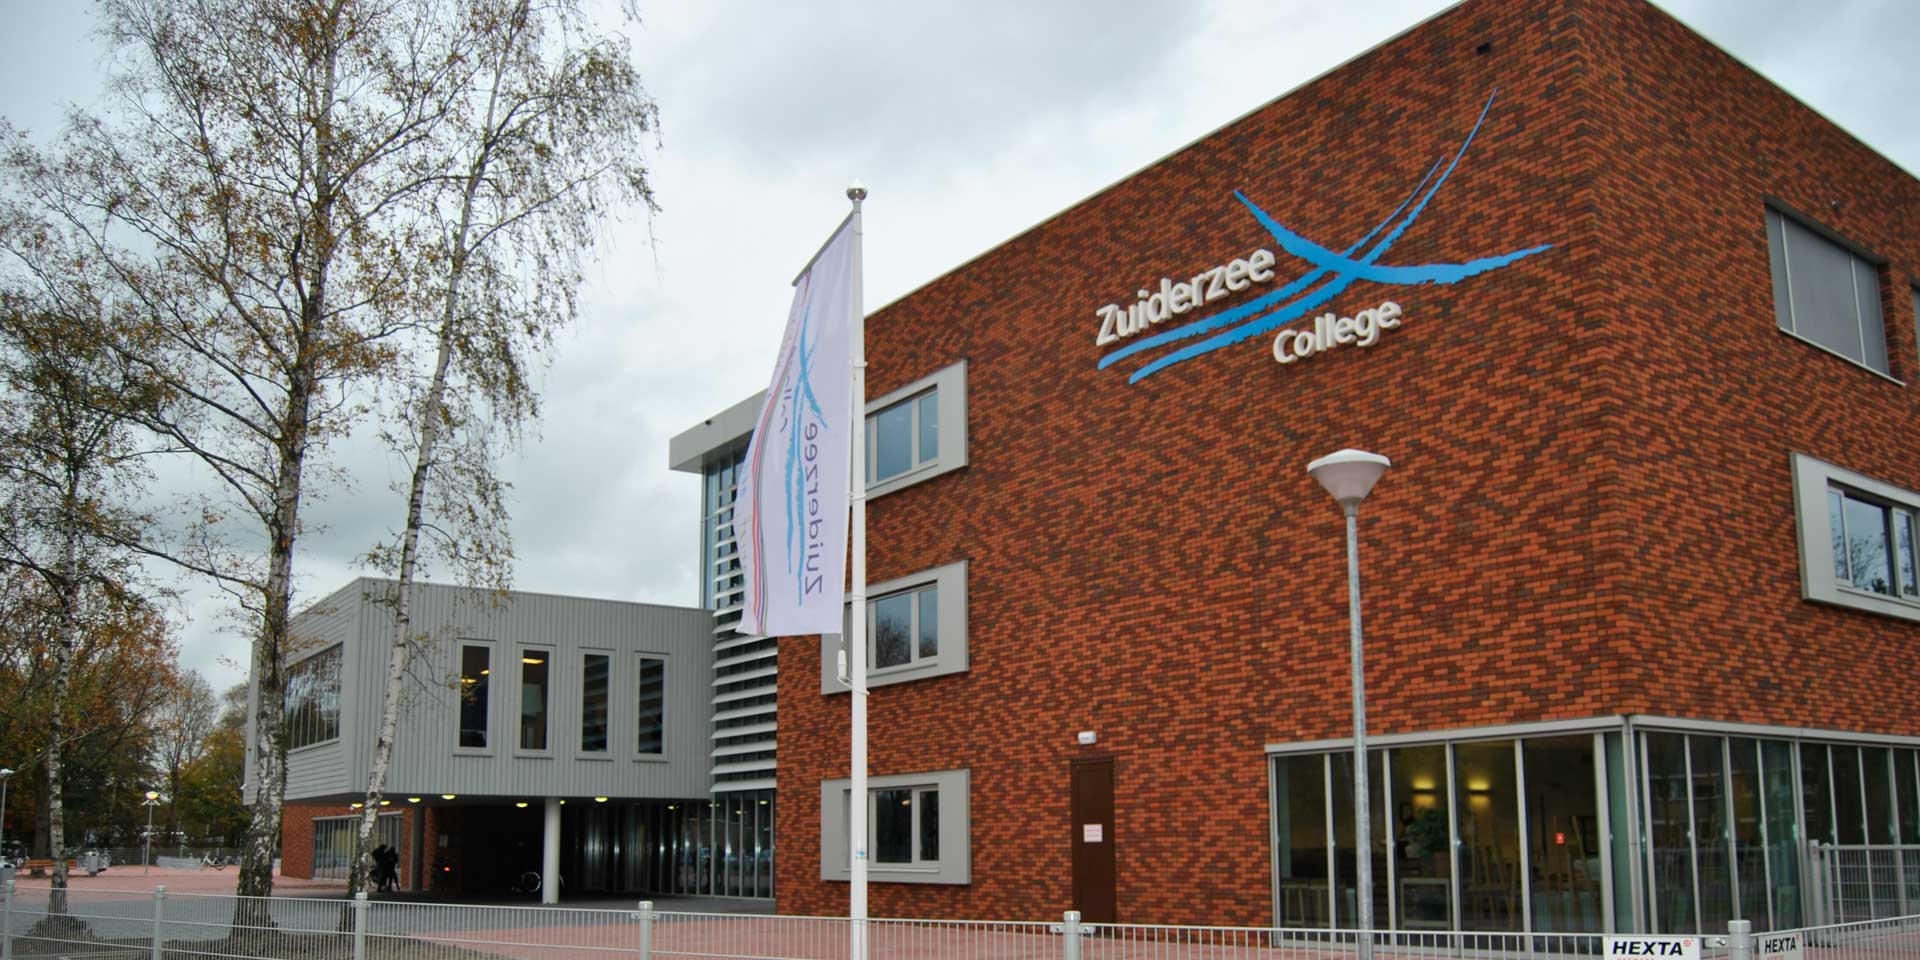 Zuiderzee College Zaandam